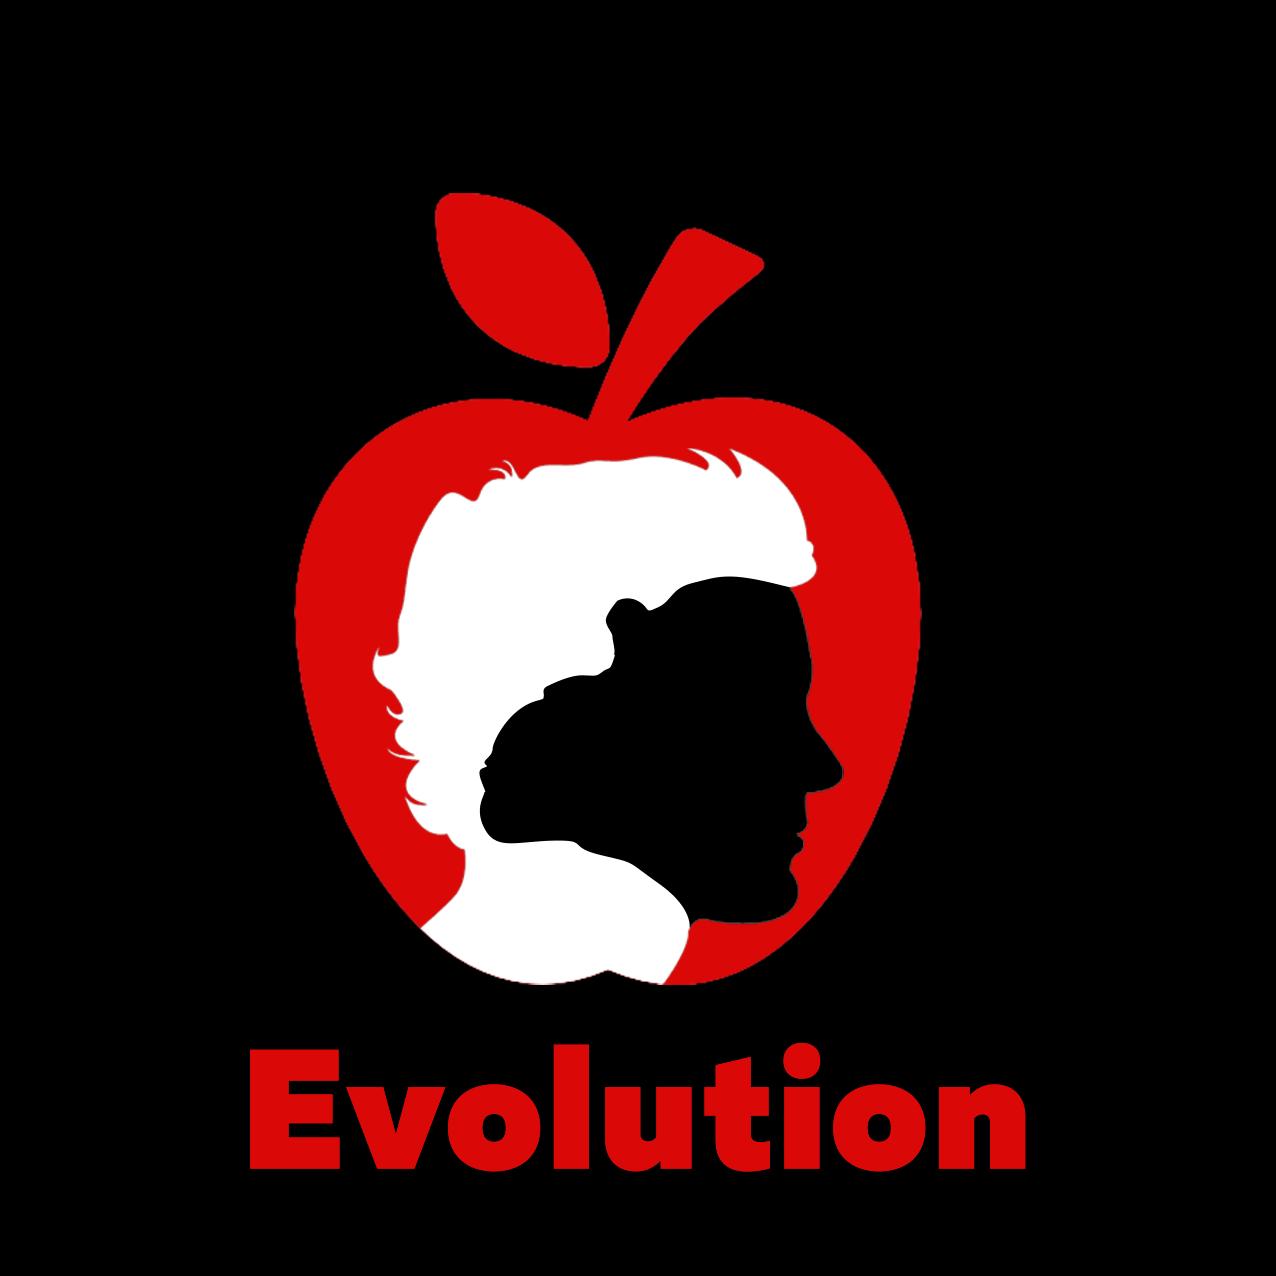 Разработать логотип для Онлайн-школы и сообщества фото f_6905bc64a79e5928.png